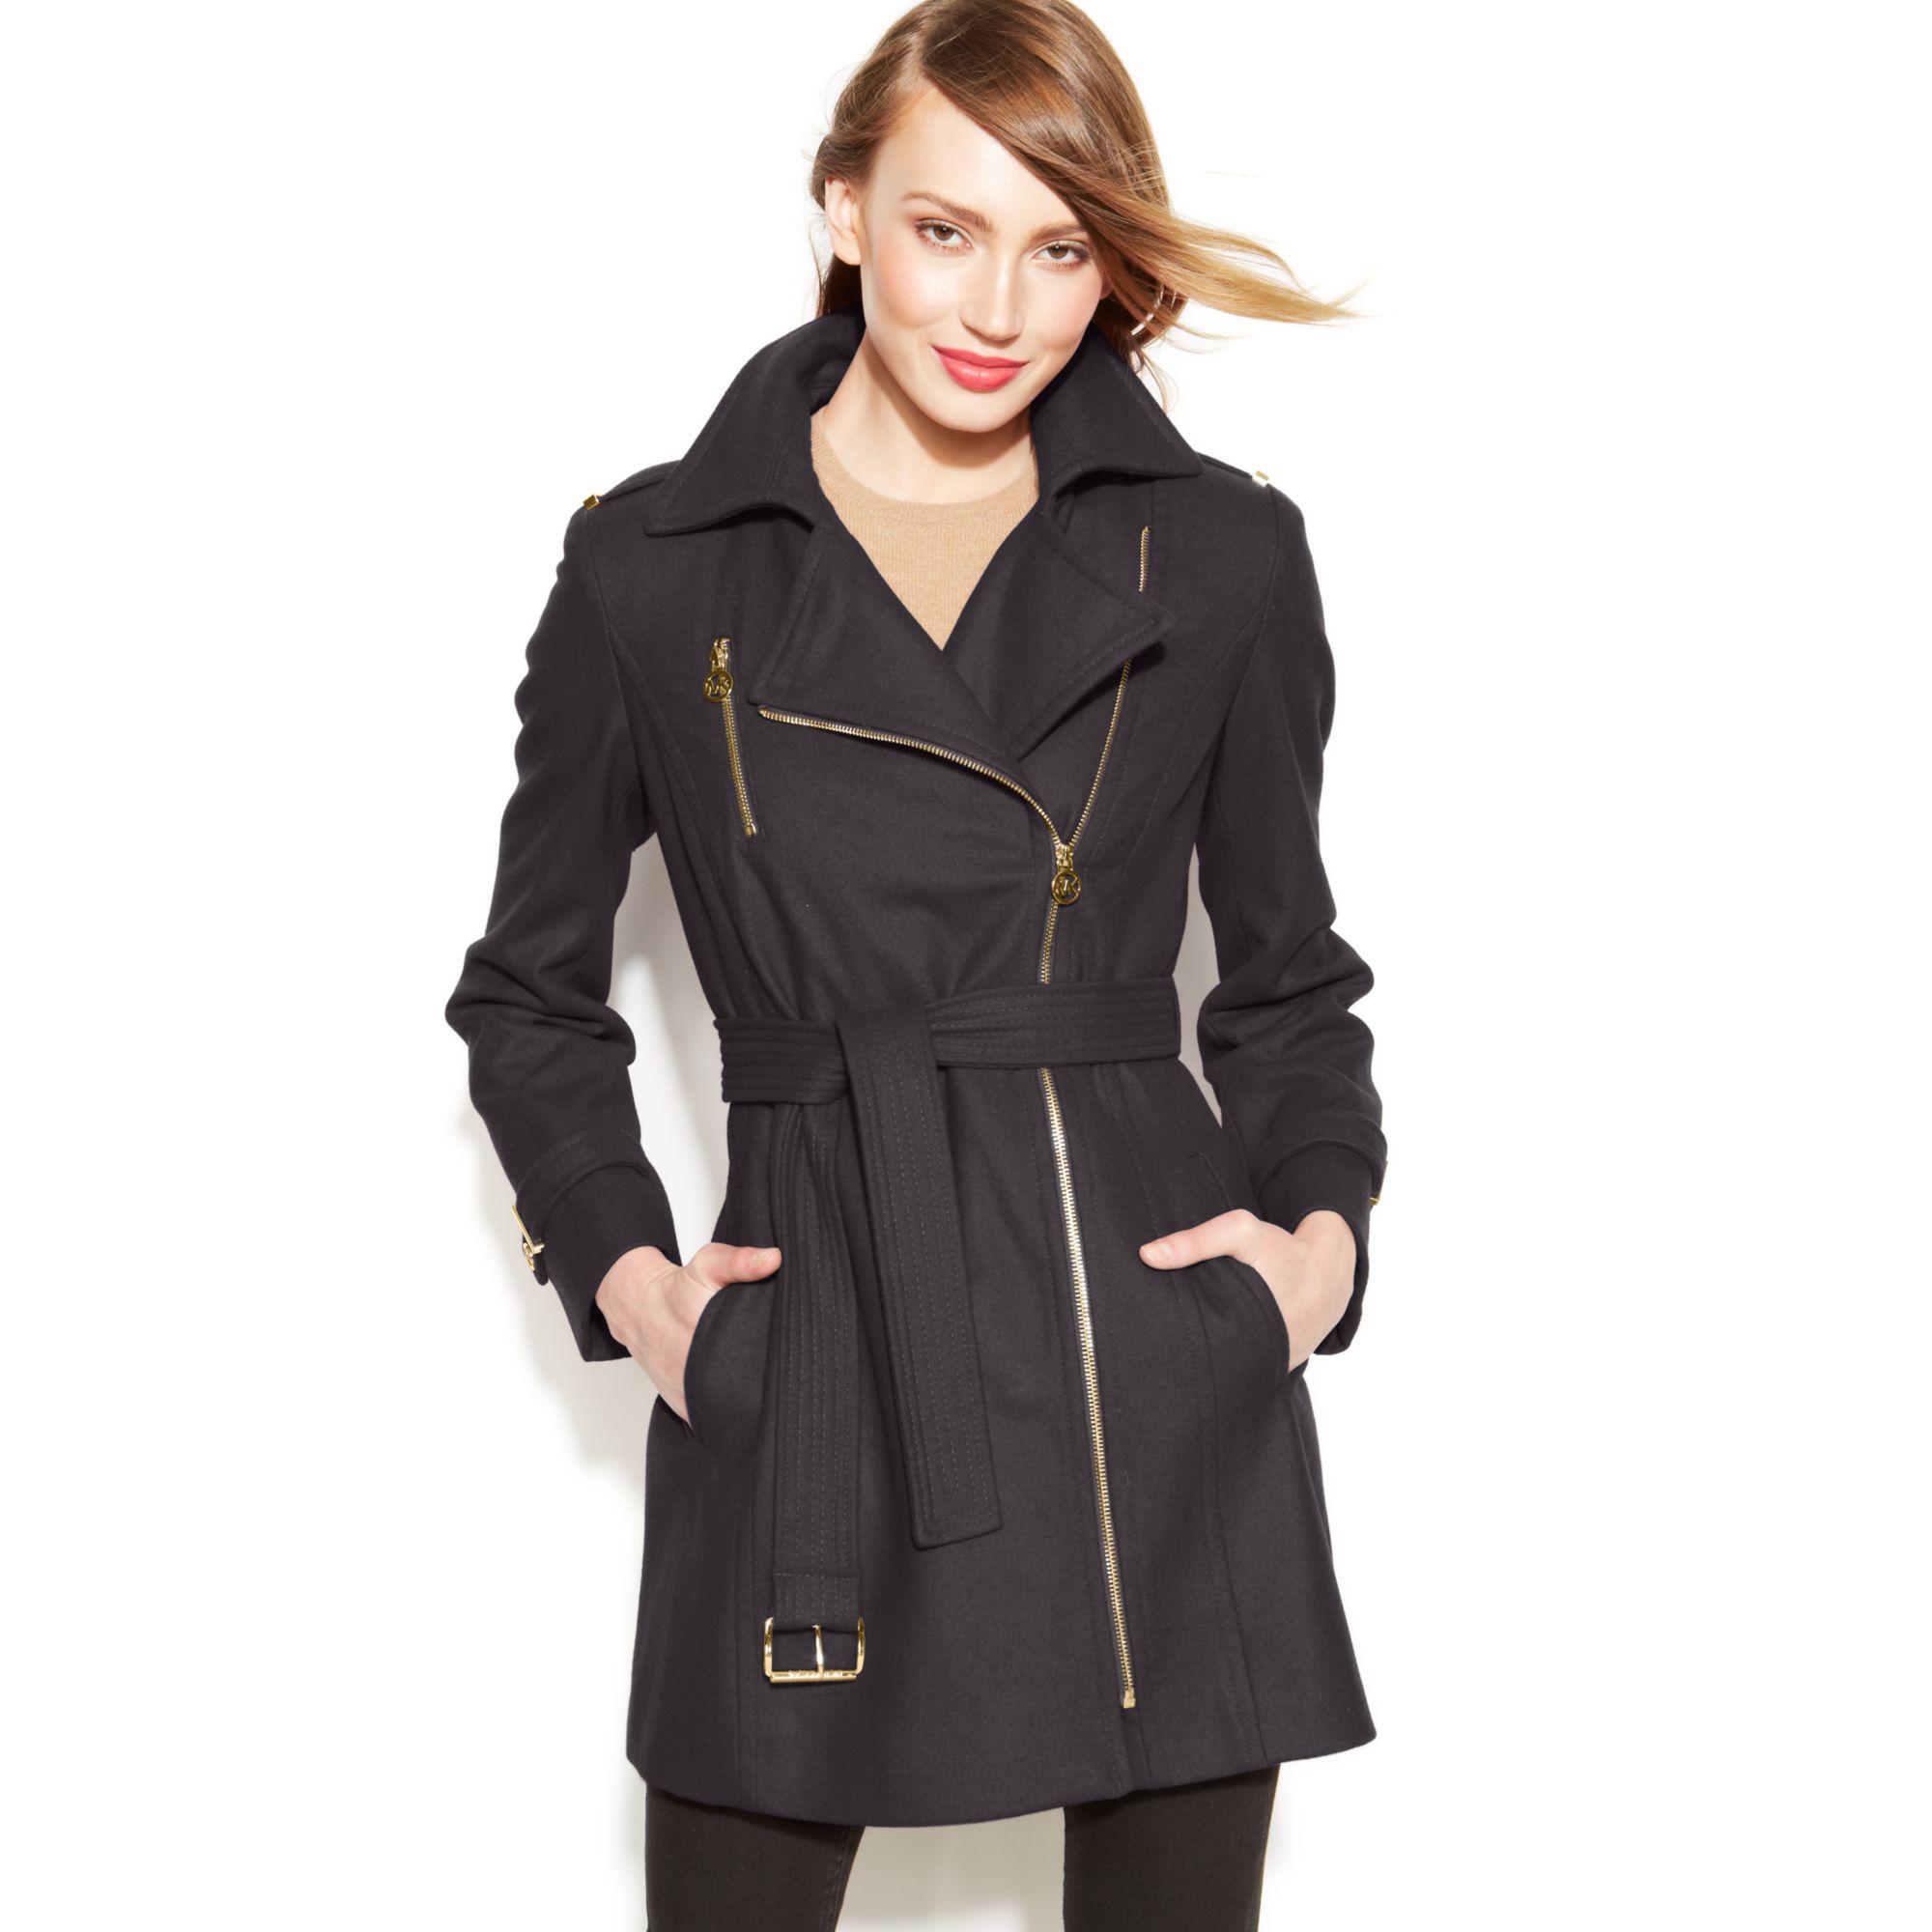 michael kors michael asymmetrical belted walker coat in gray medium grey lyst. Black Bedroom Furniture Sets. Home Design Ideas